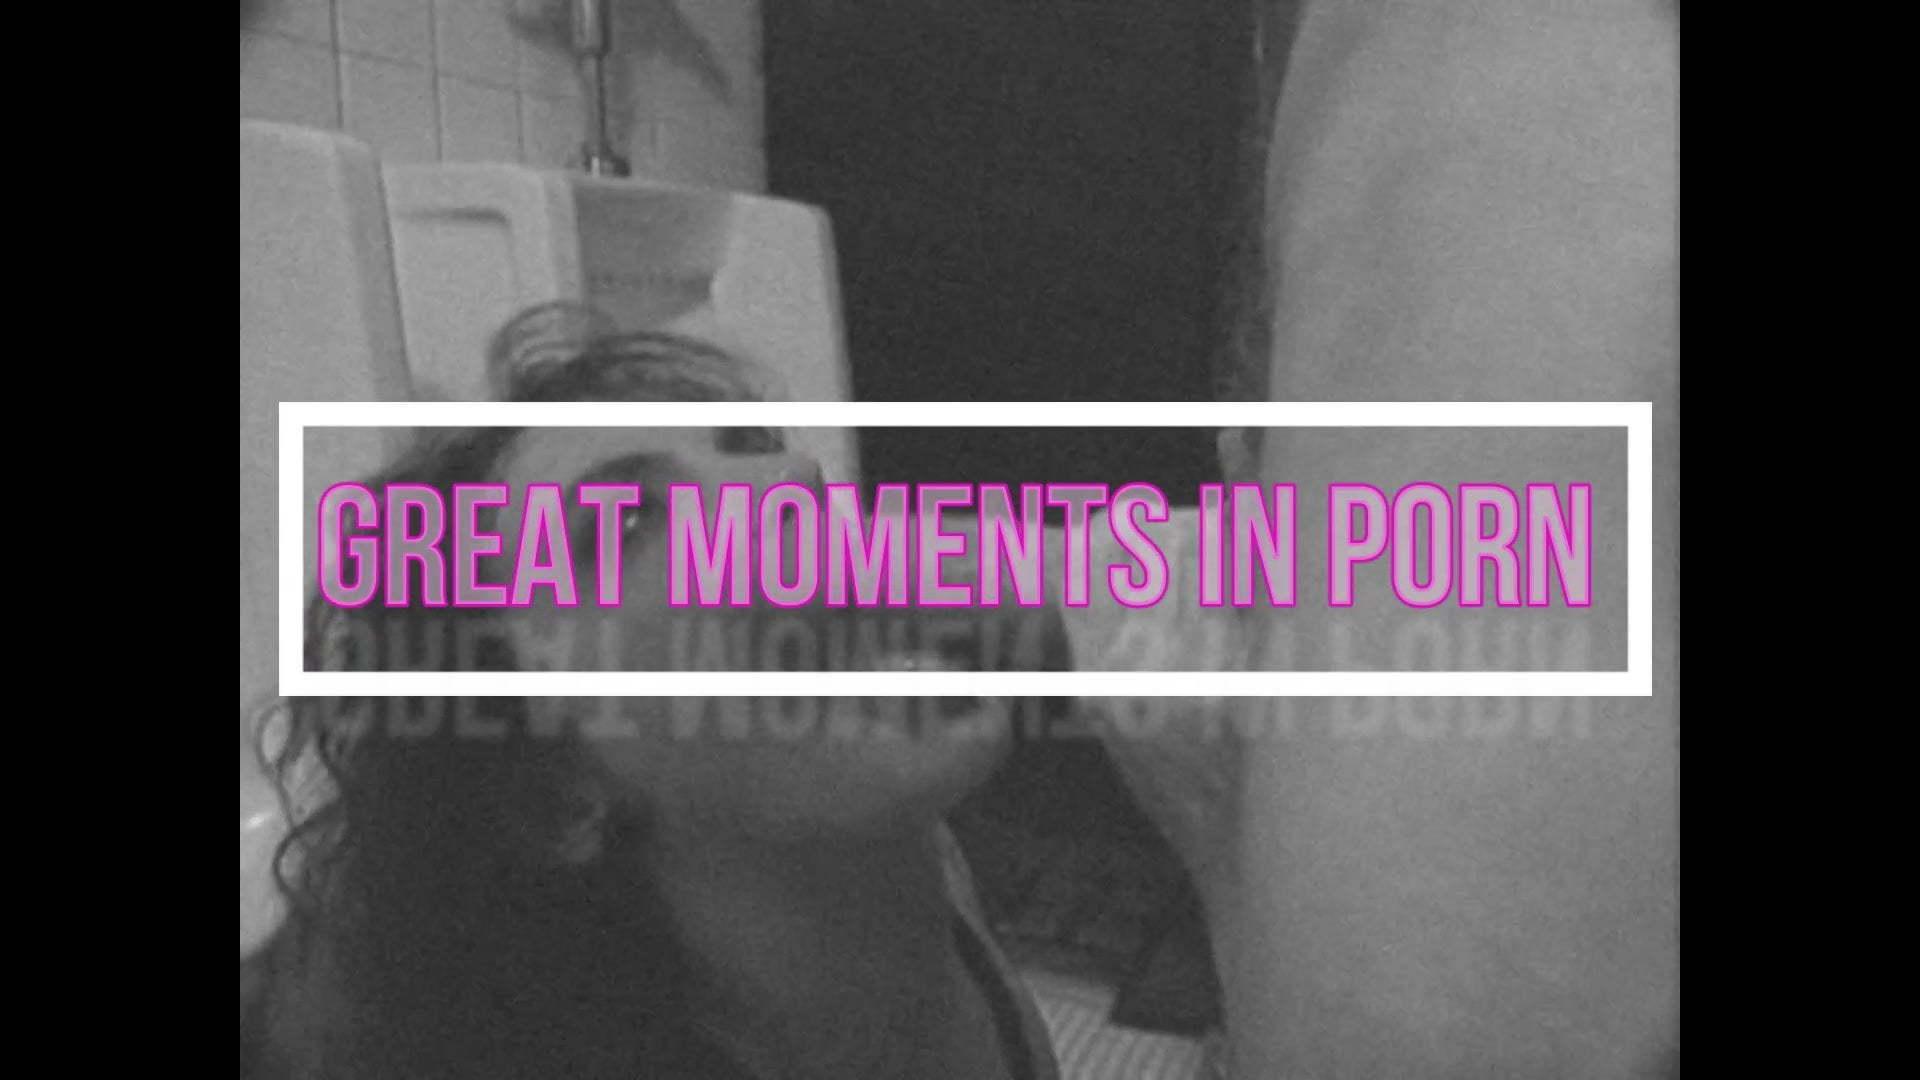 Ashlyn Gere Videos Porno Hd great moments in porn - ashlyn gere